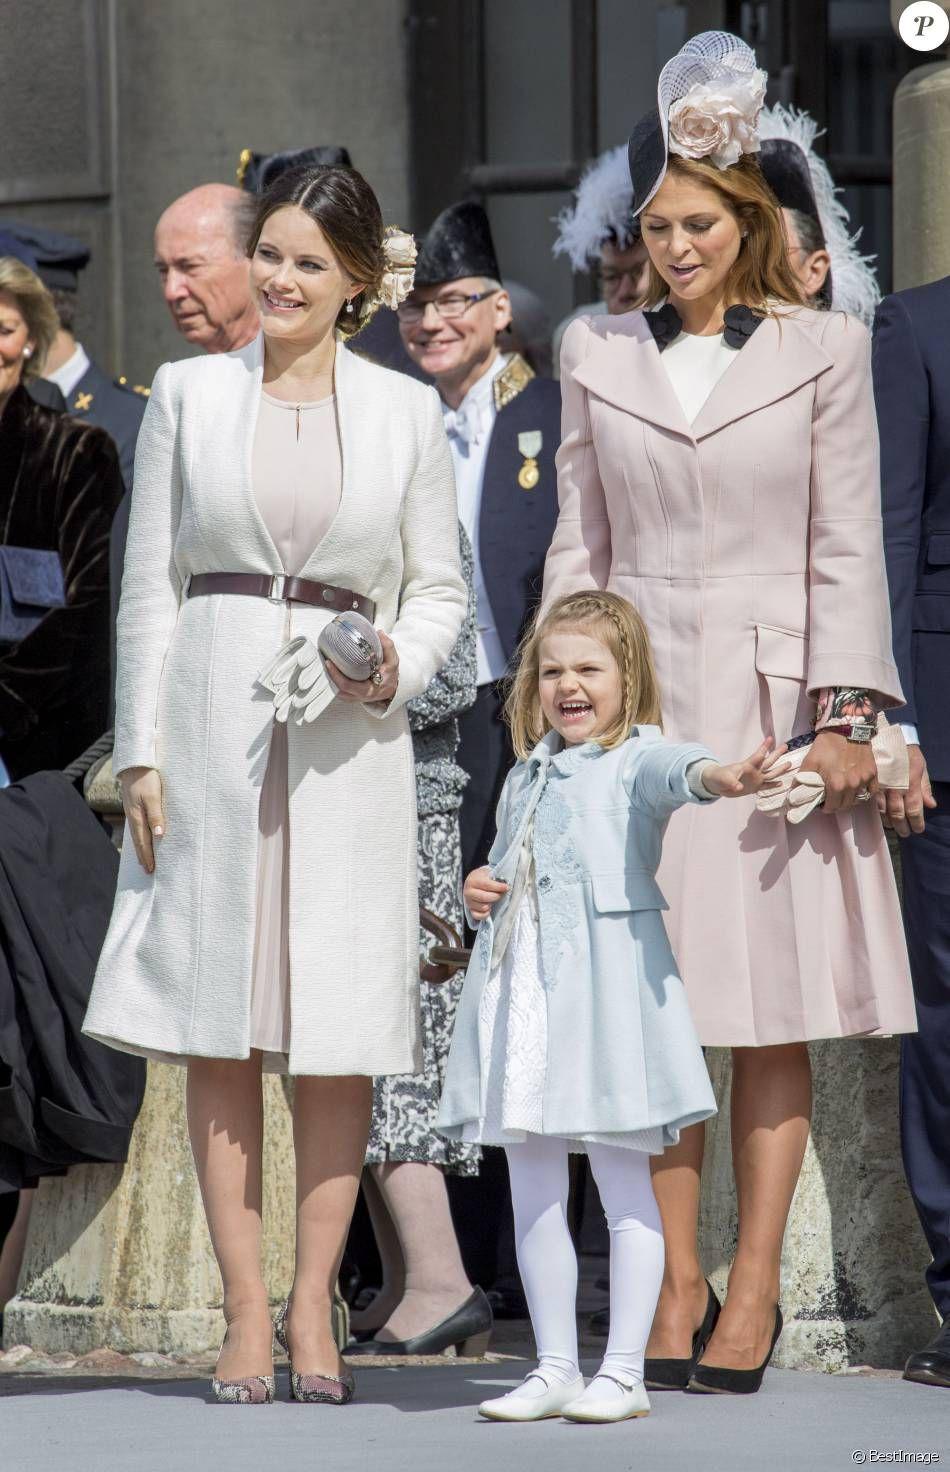 photos la princesse sofia hellqvist la princesse madeleine et la princesse estelle de su de. Black Bedroom Furniture Sets. Home Design Ideas